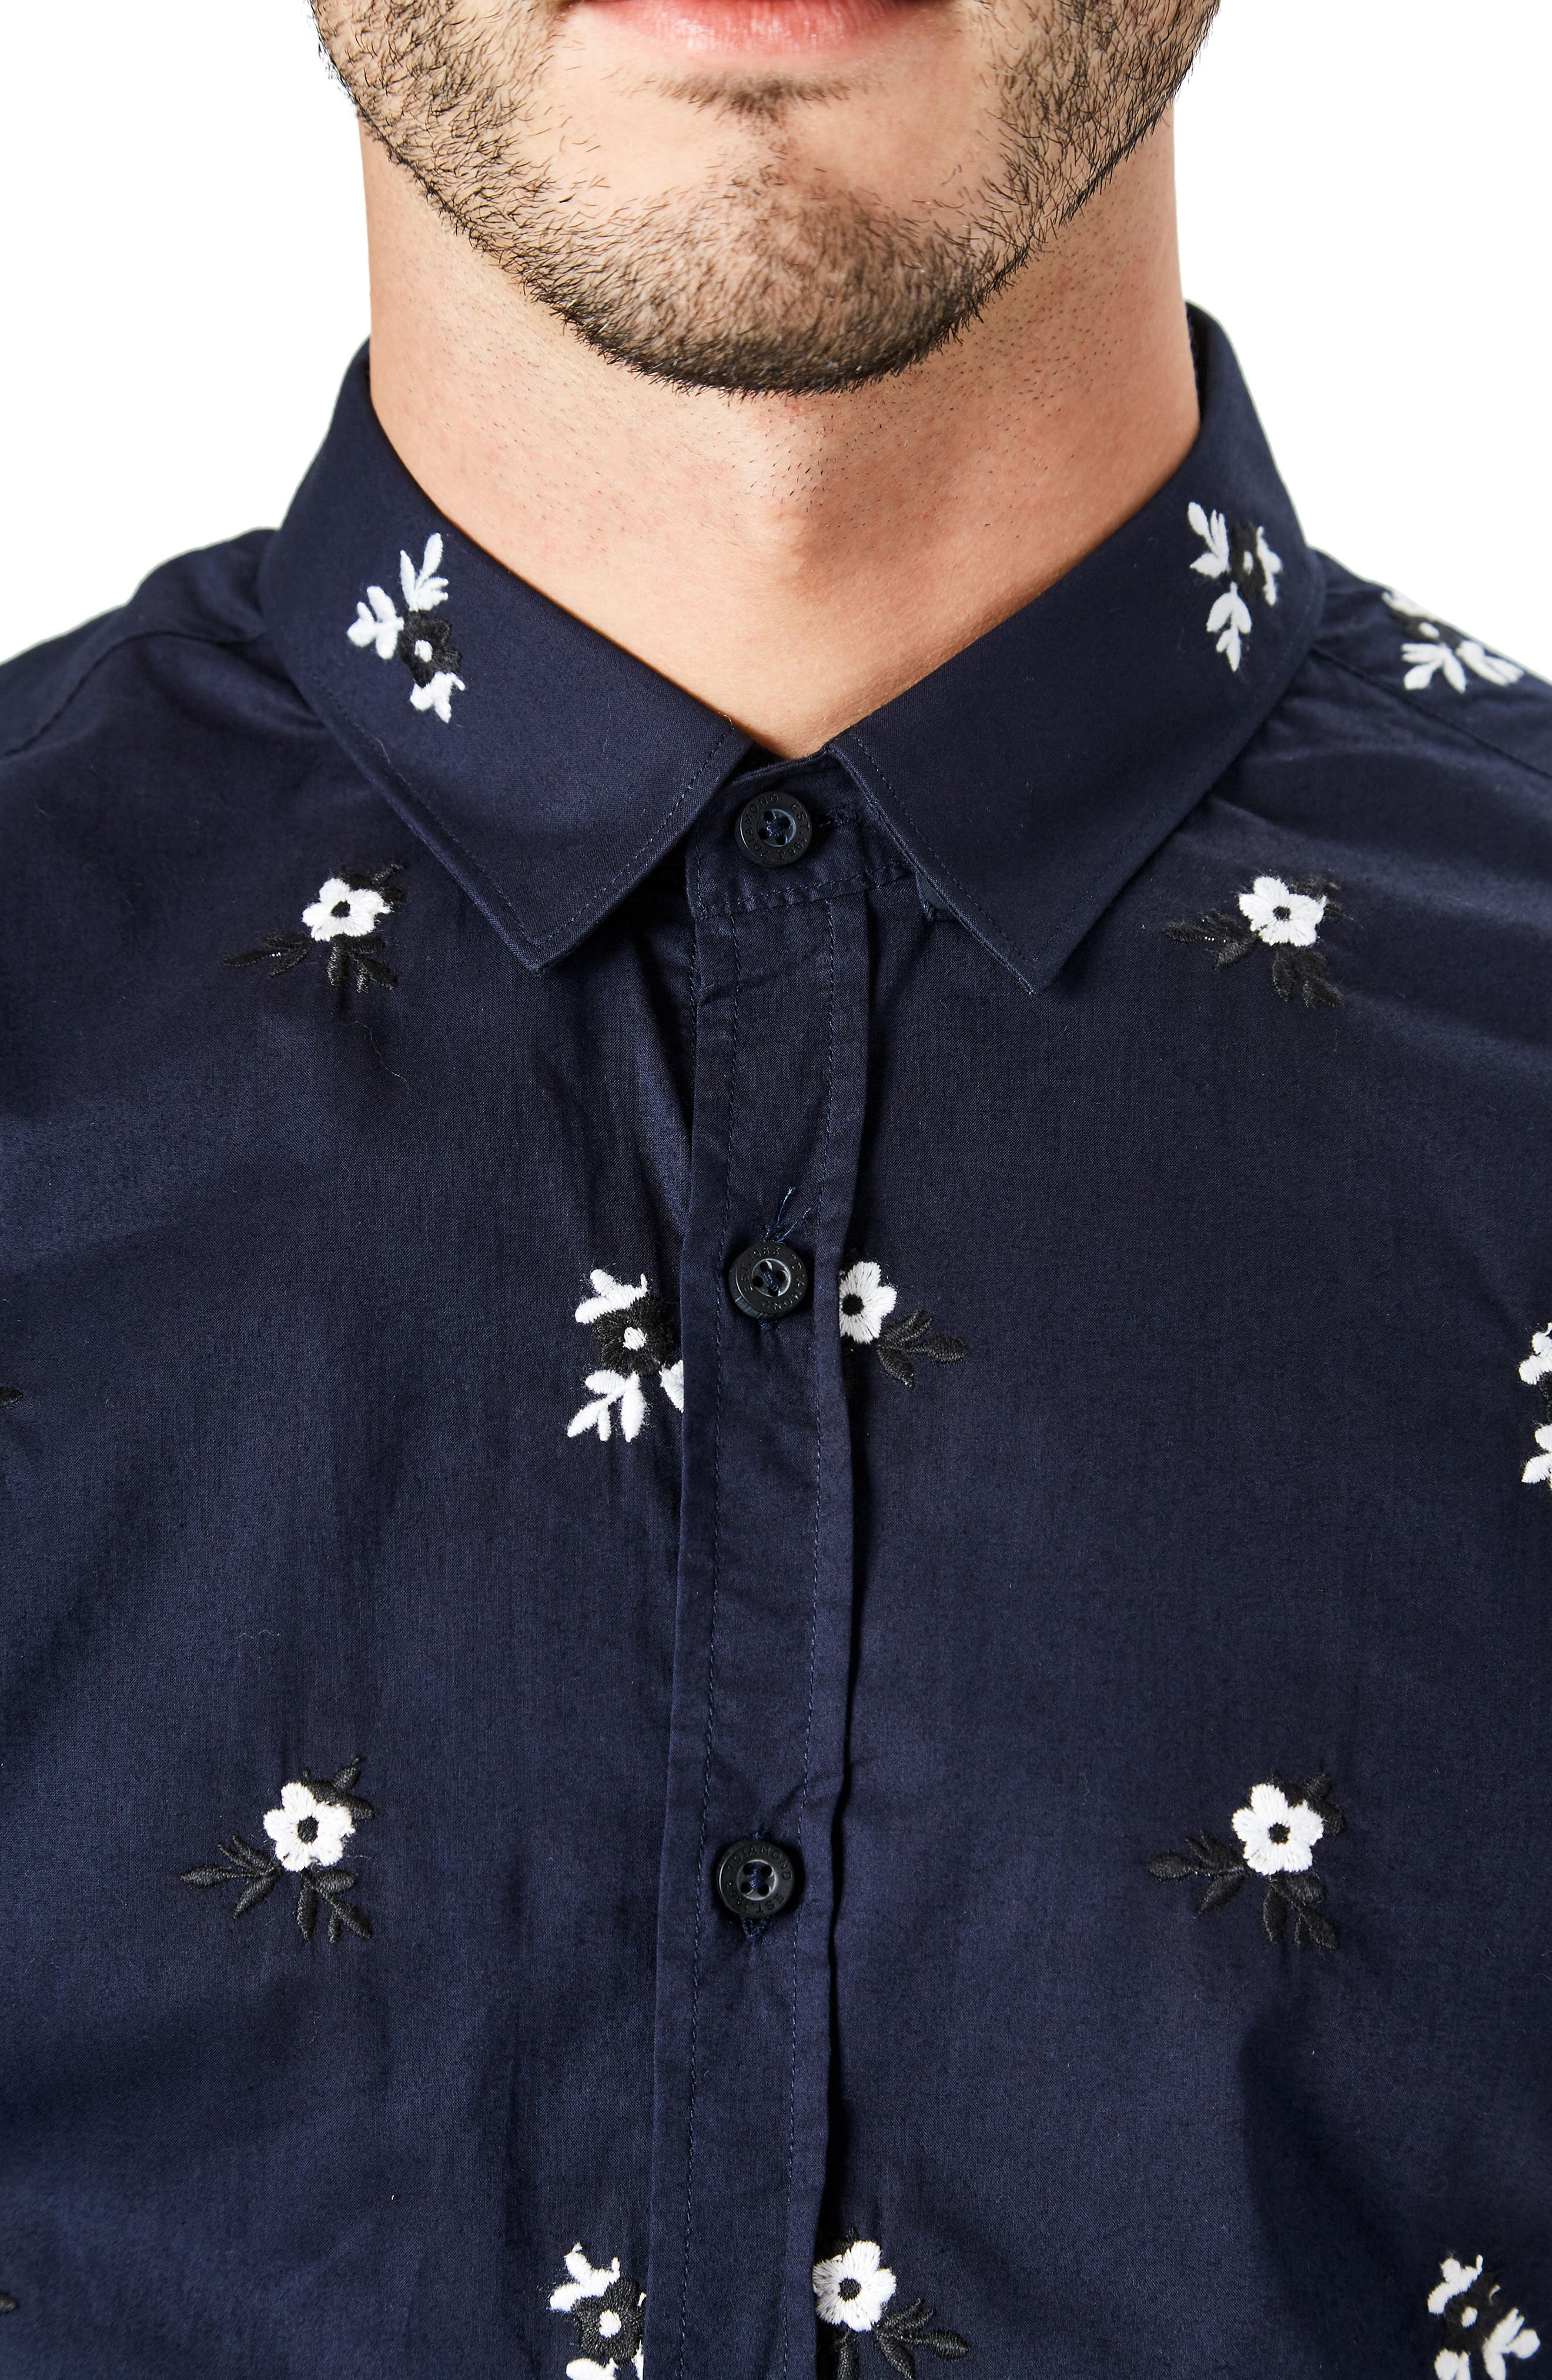 Isolator Woven Shirt,                             Alternate thumbnail 2, color,                             Navy